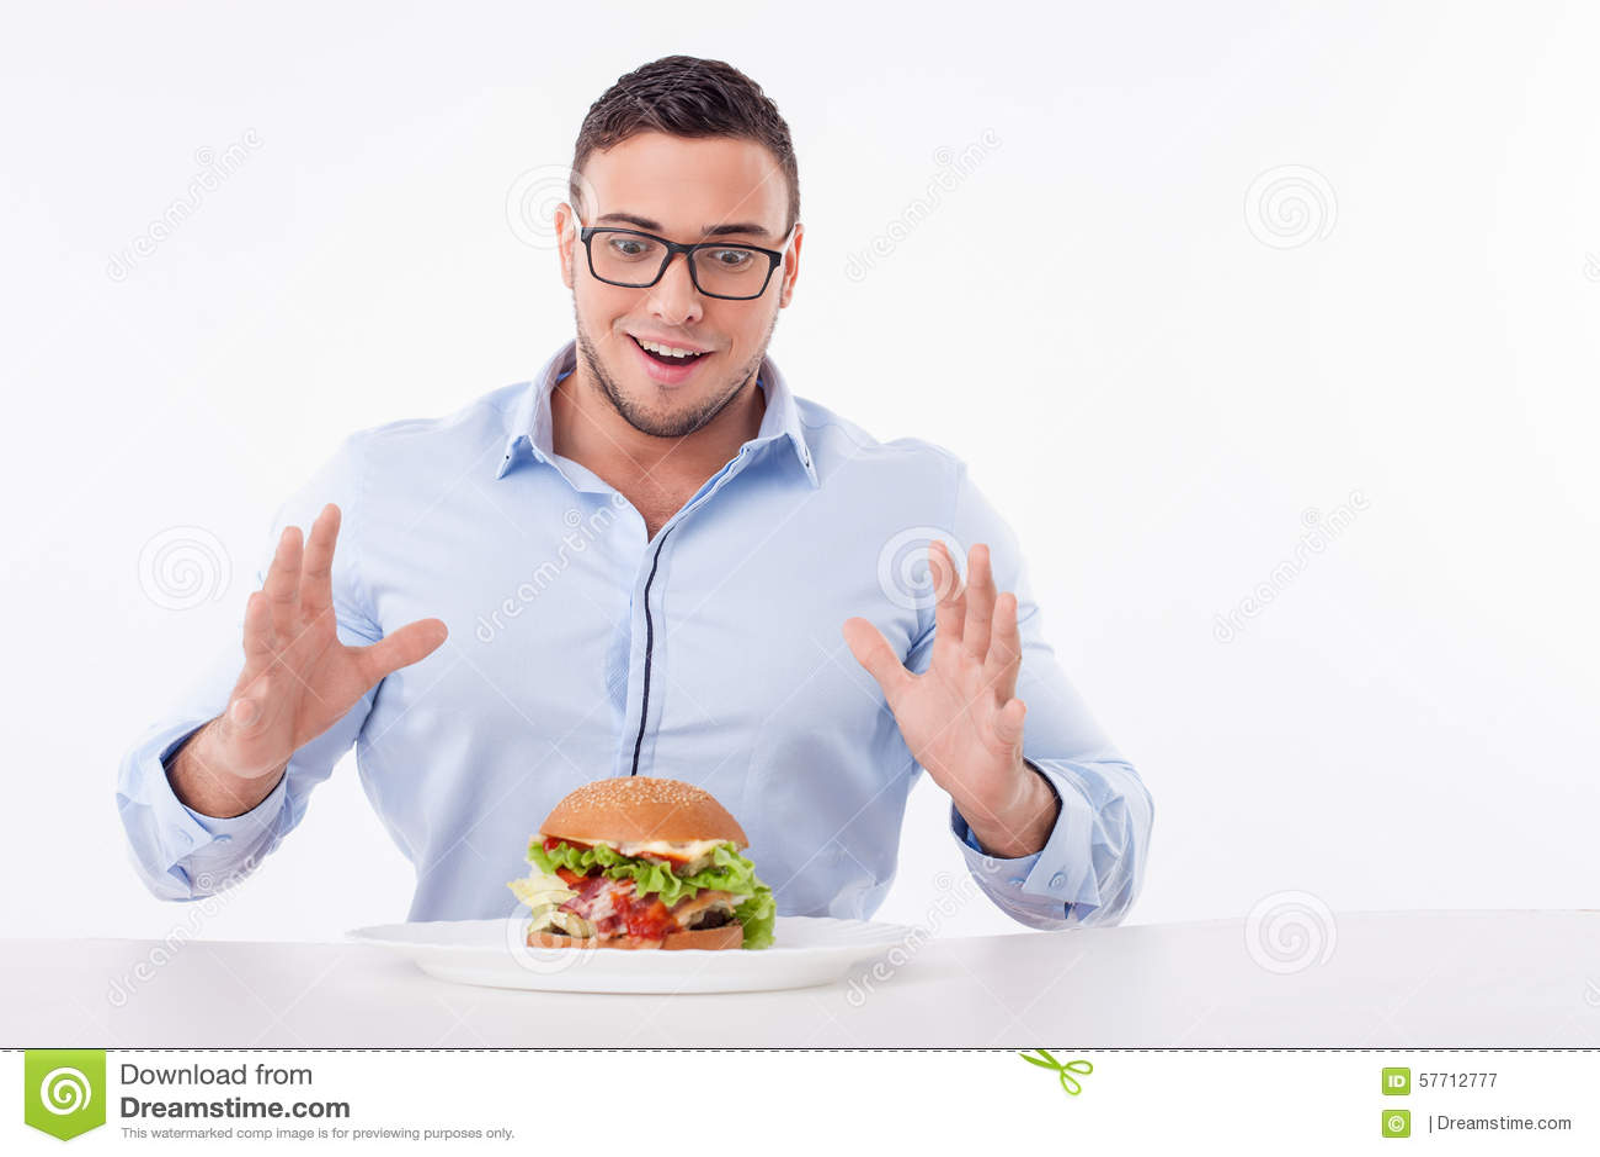 how to eat pho white guy